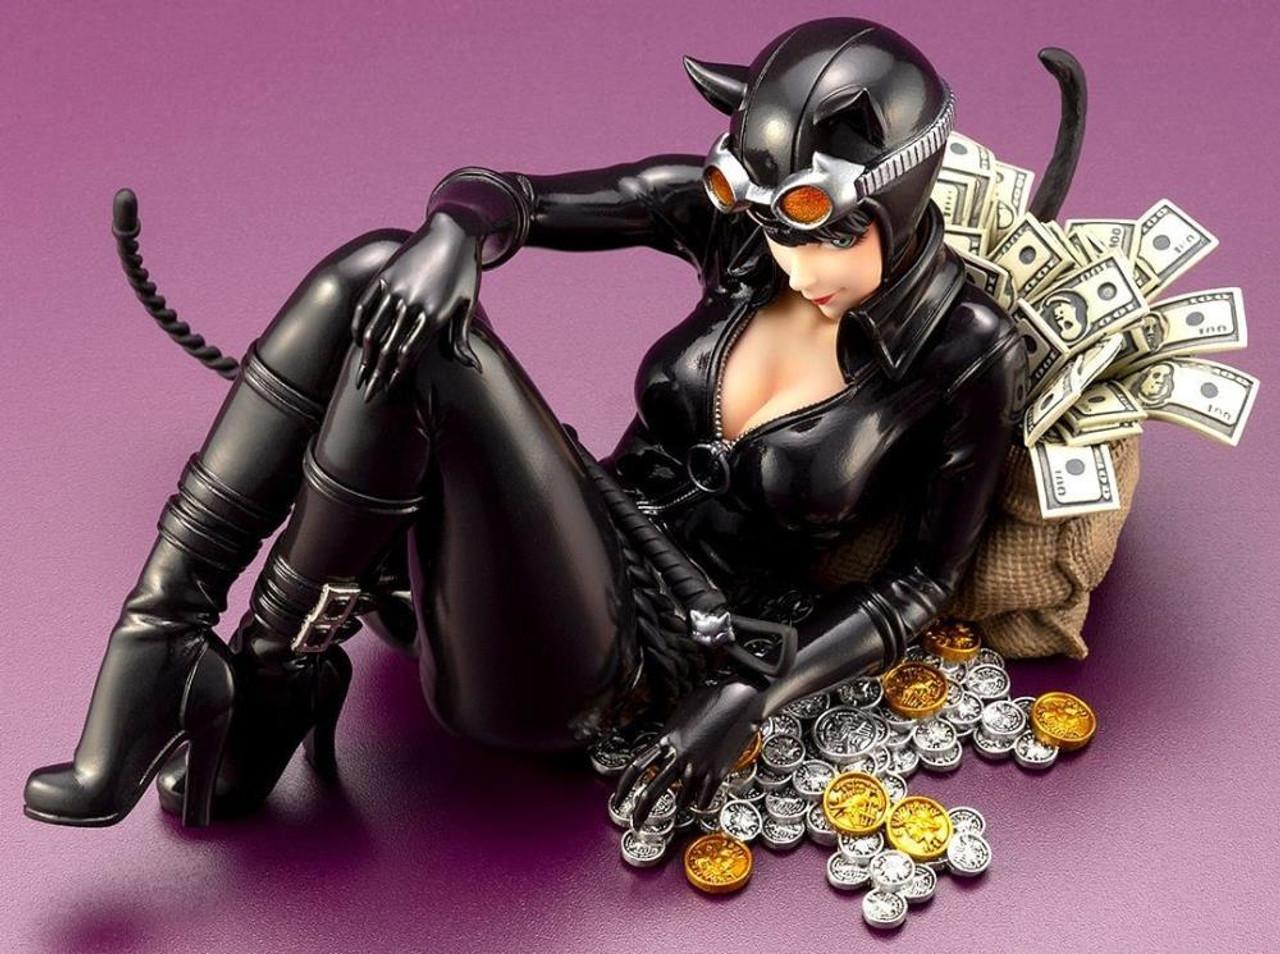 DC Comics - Catwoman Returns Bishoujo Statue